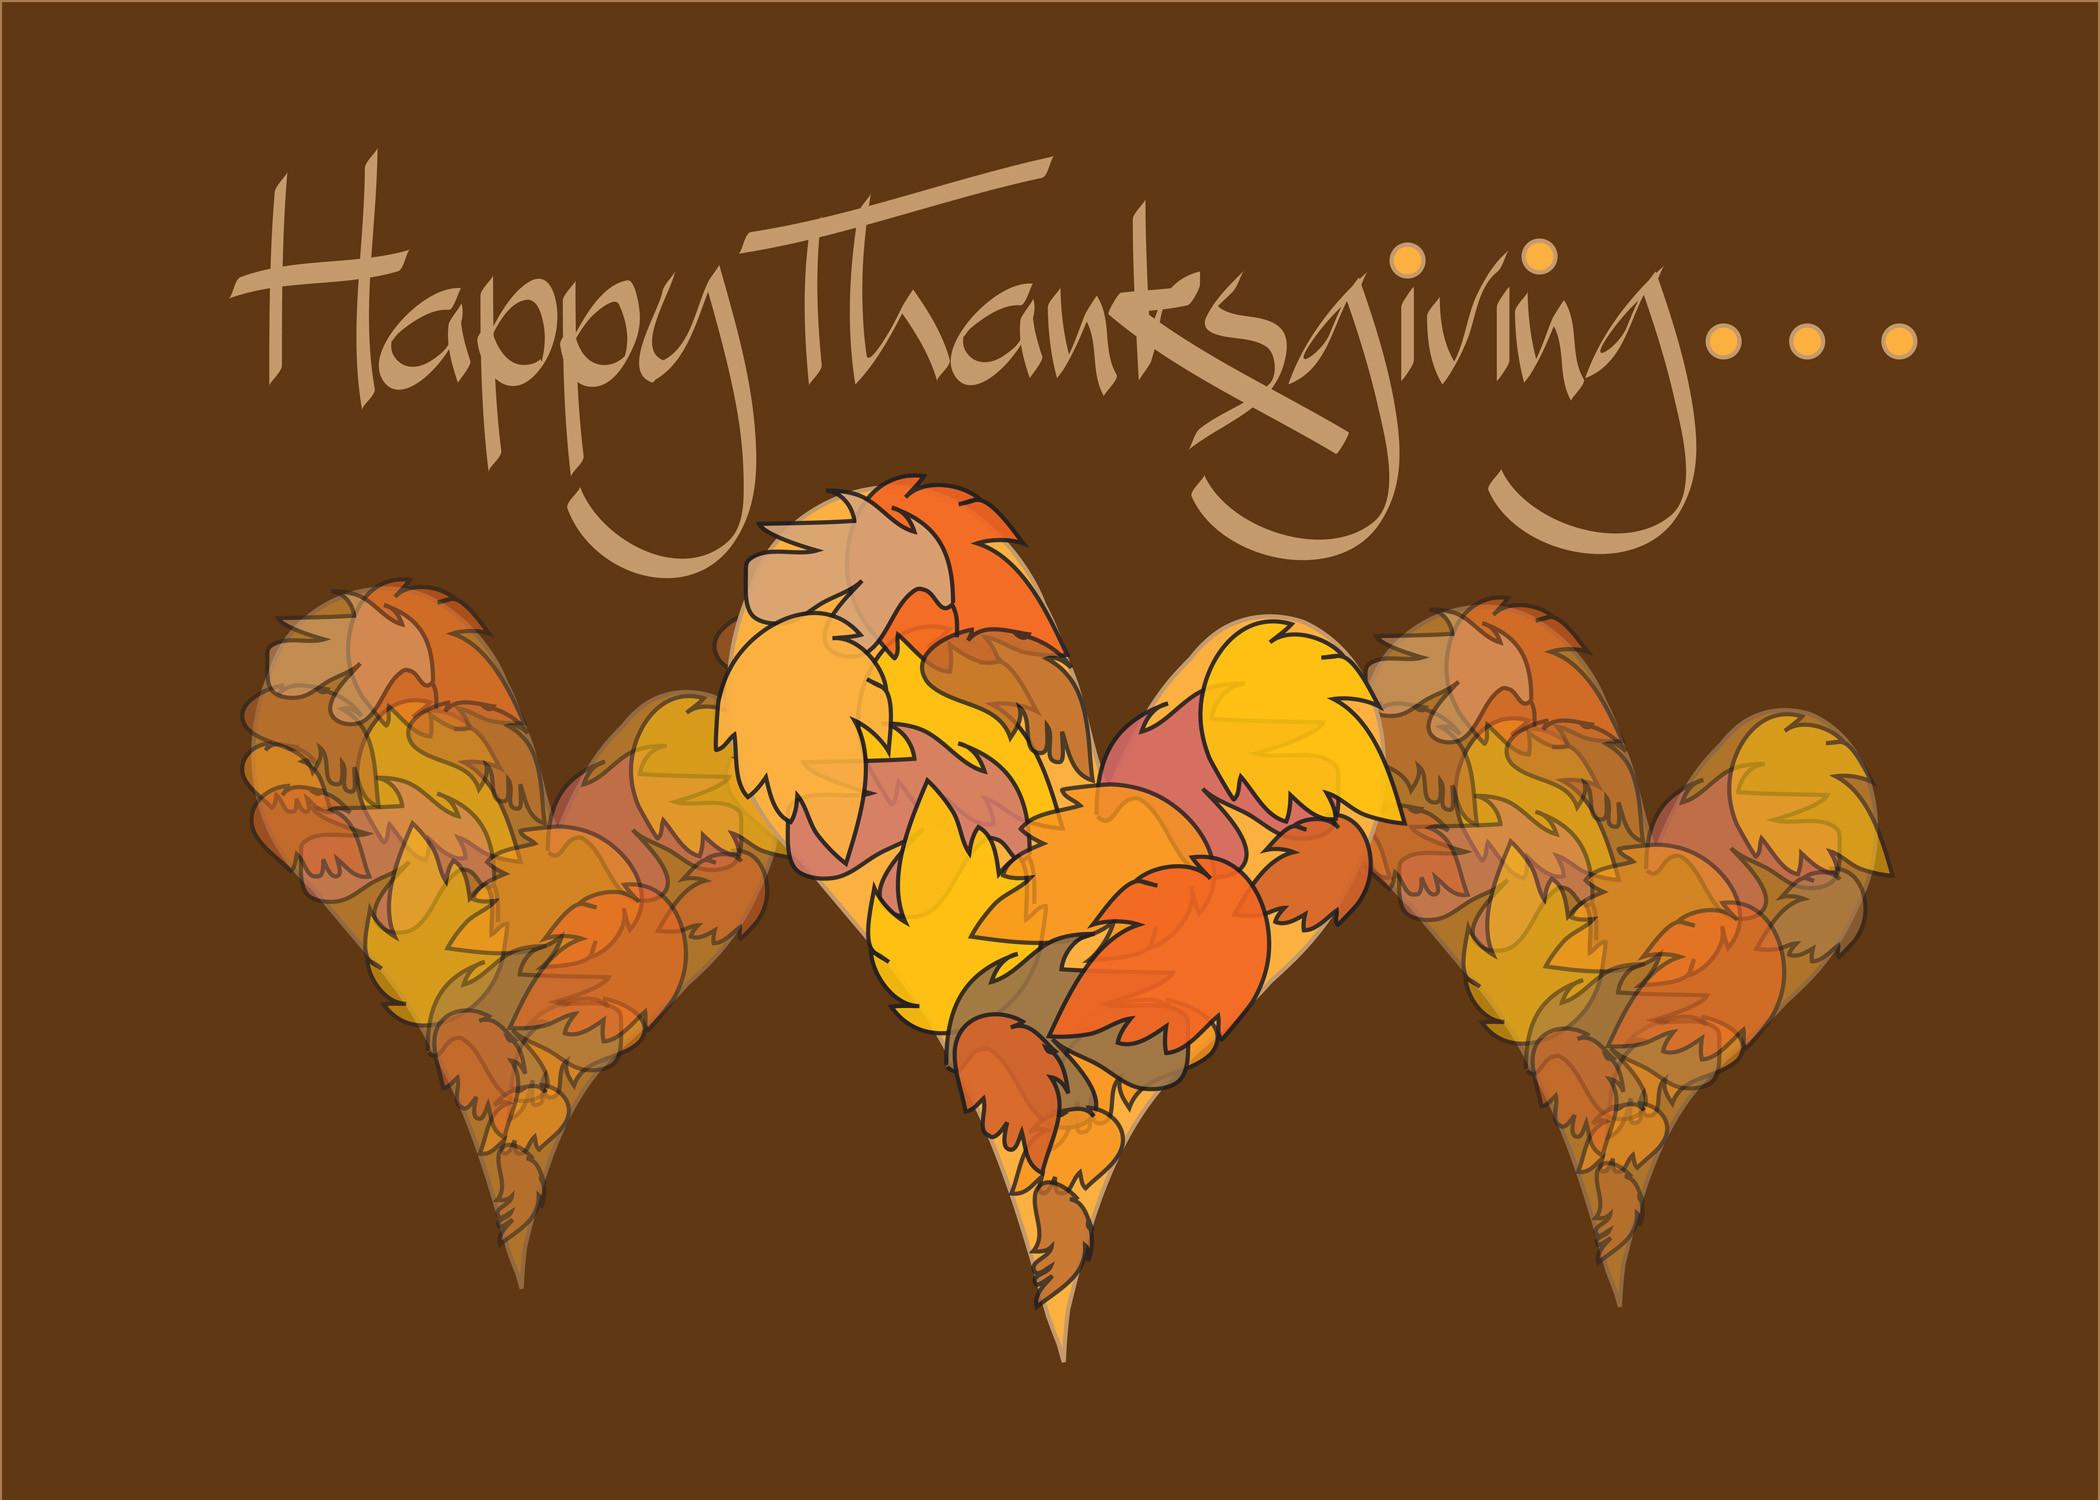 Thanksgiving Desktop Wallpaper for laptop. Print